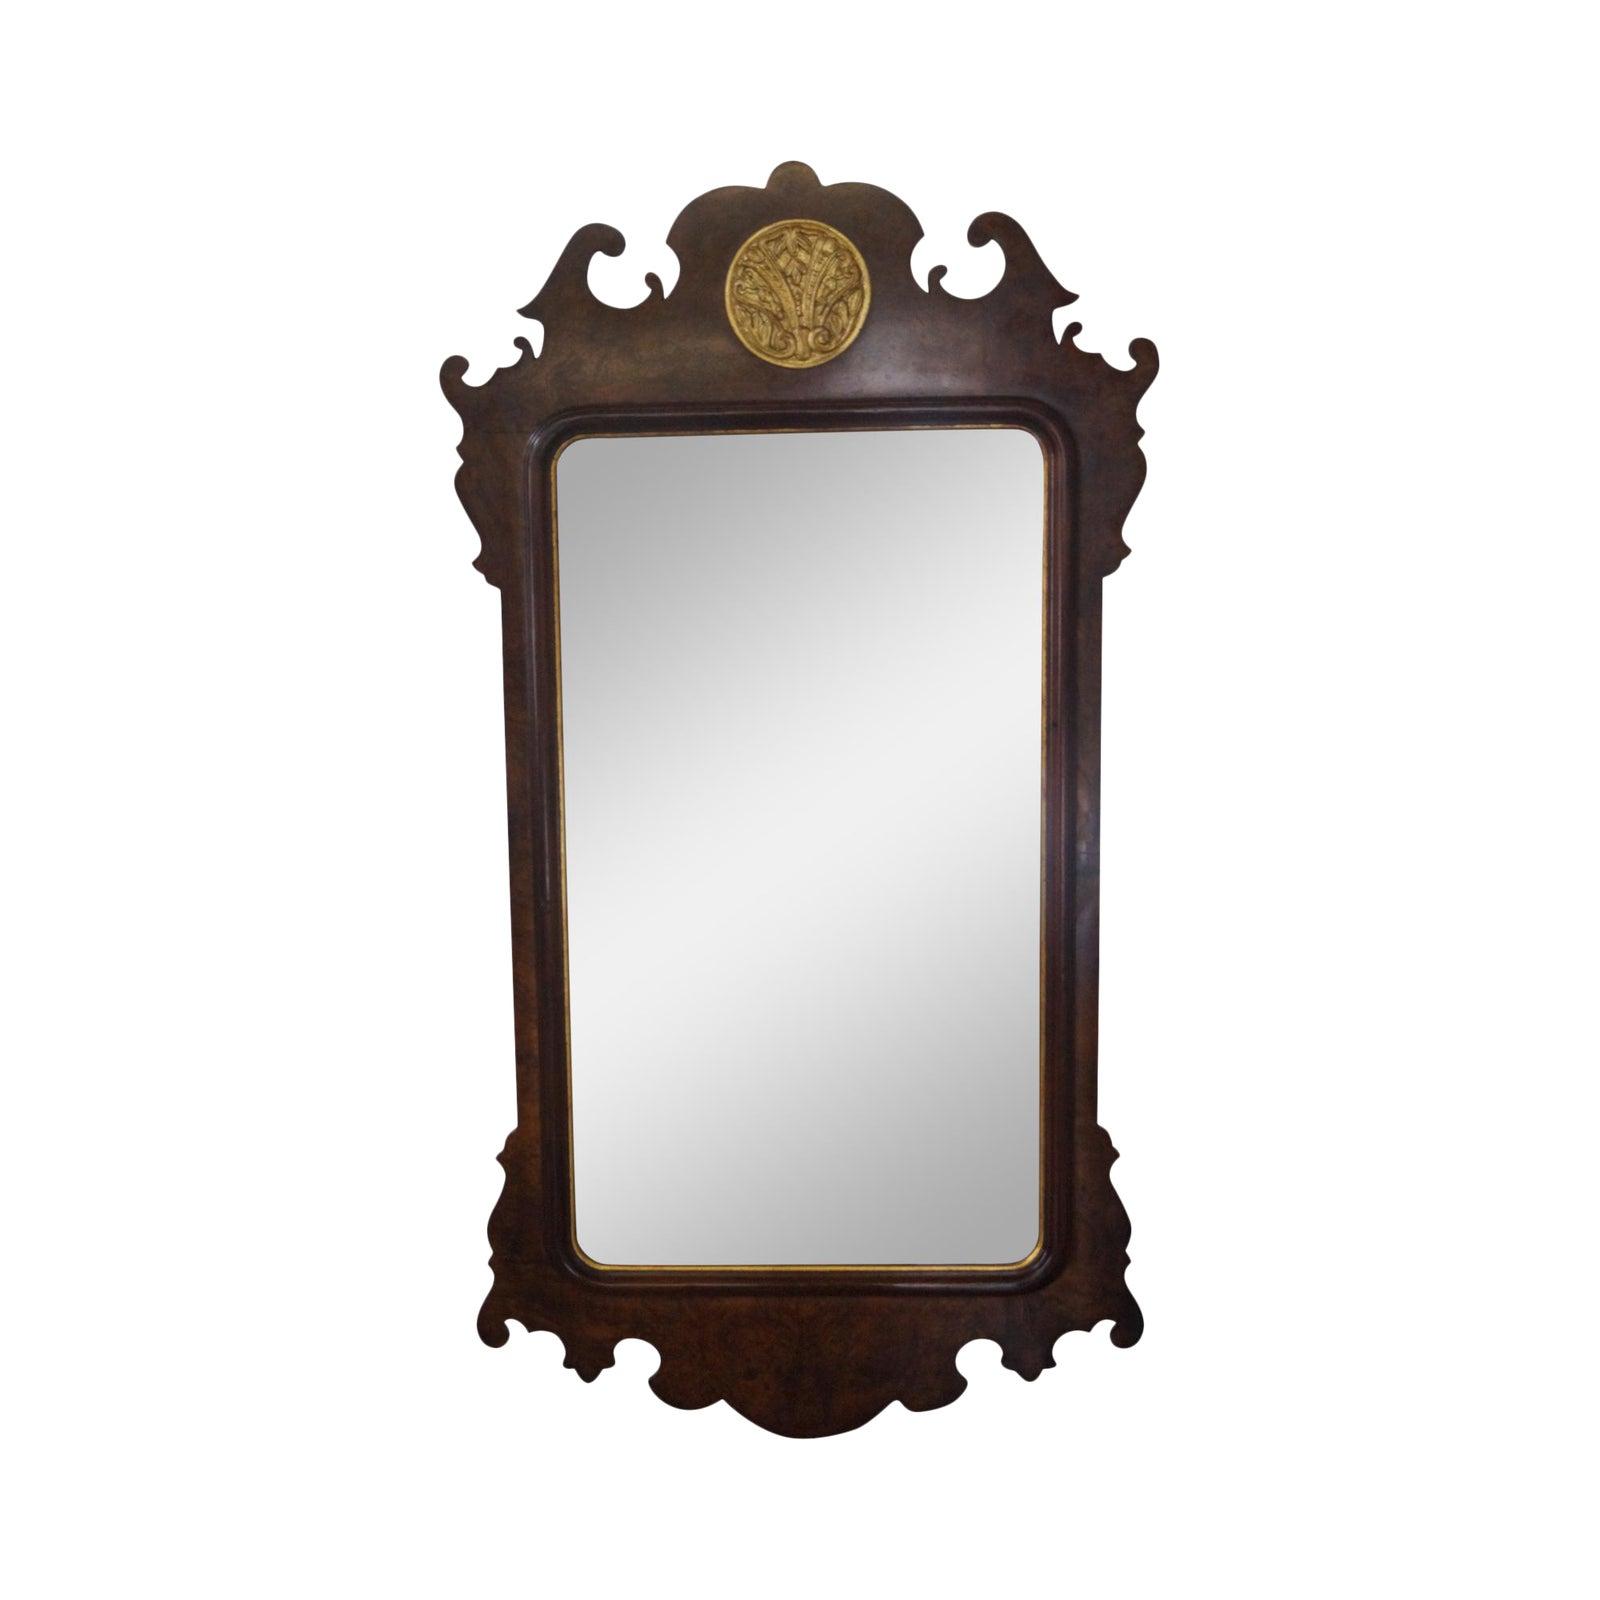 Henredon Chippendale Style Beveled Wall Mirror Chairish